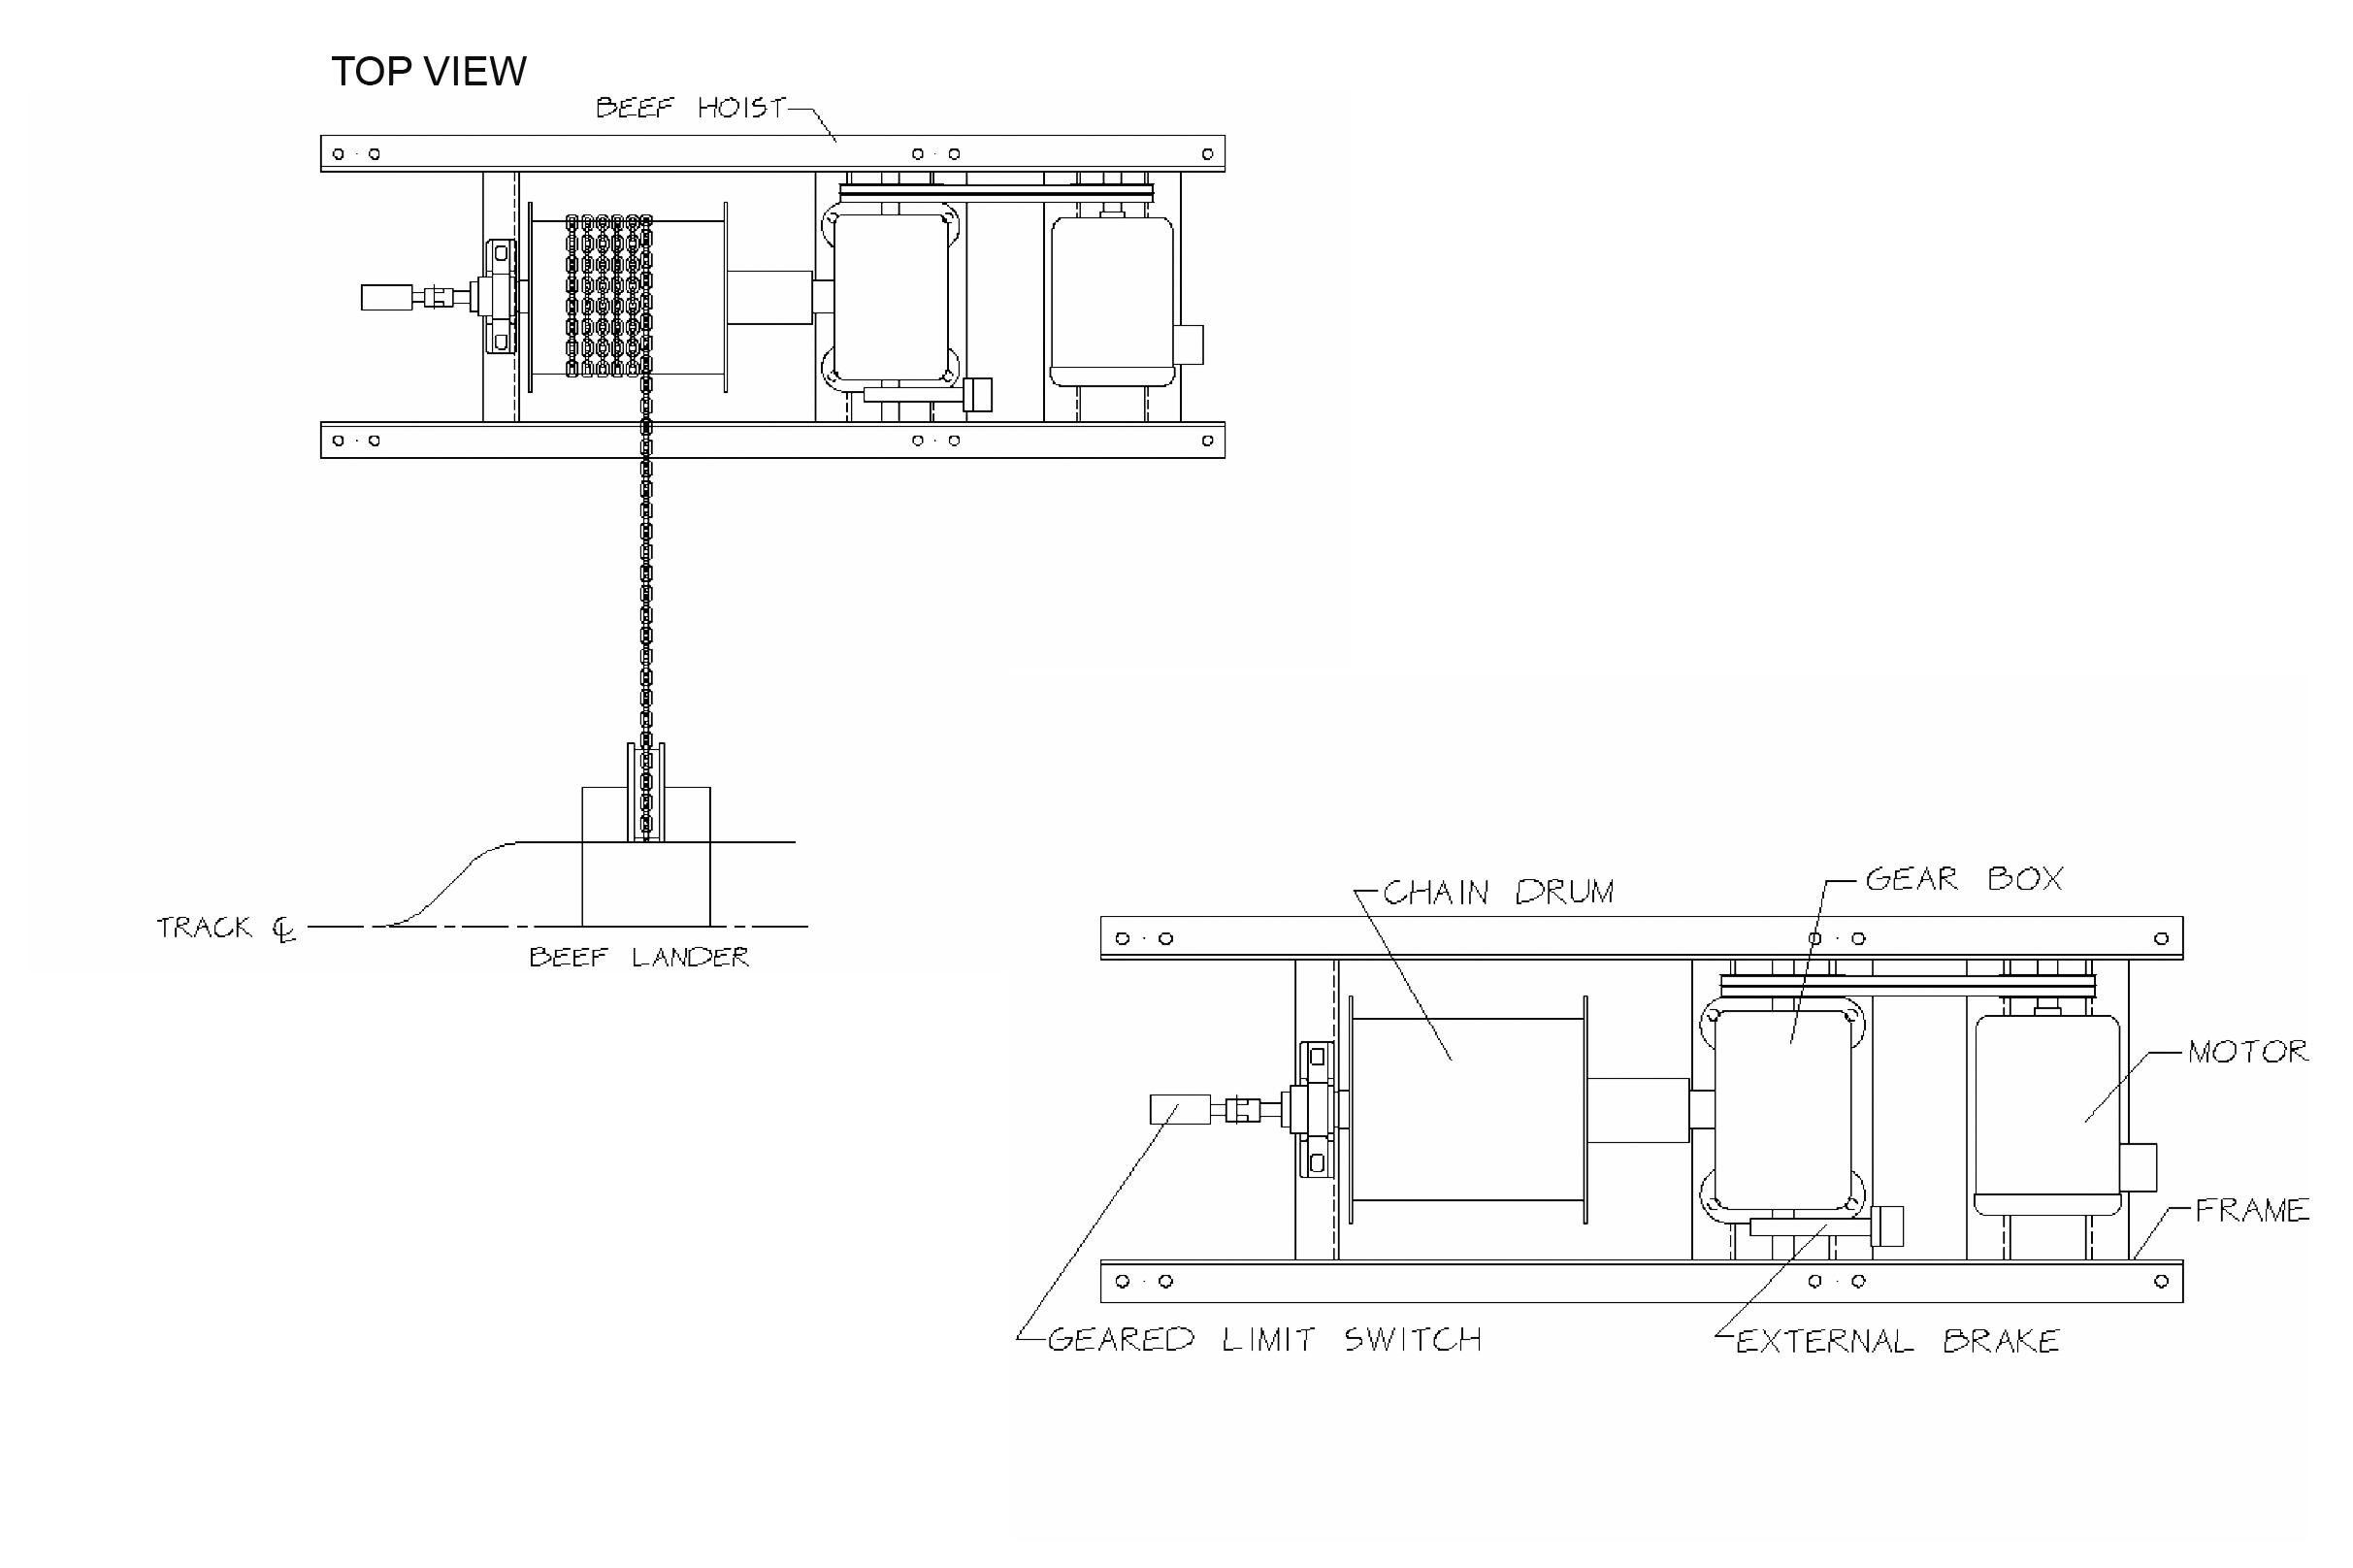 wiring diagram for vanguard 23 hp engine